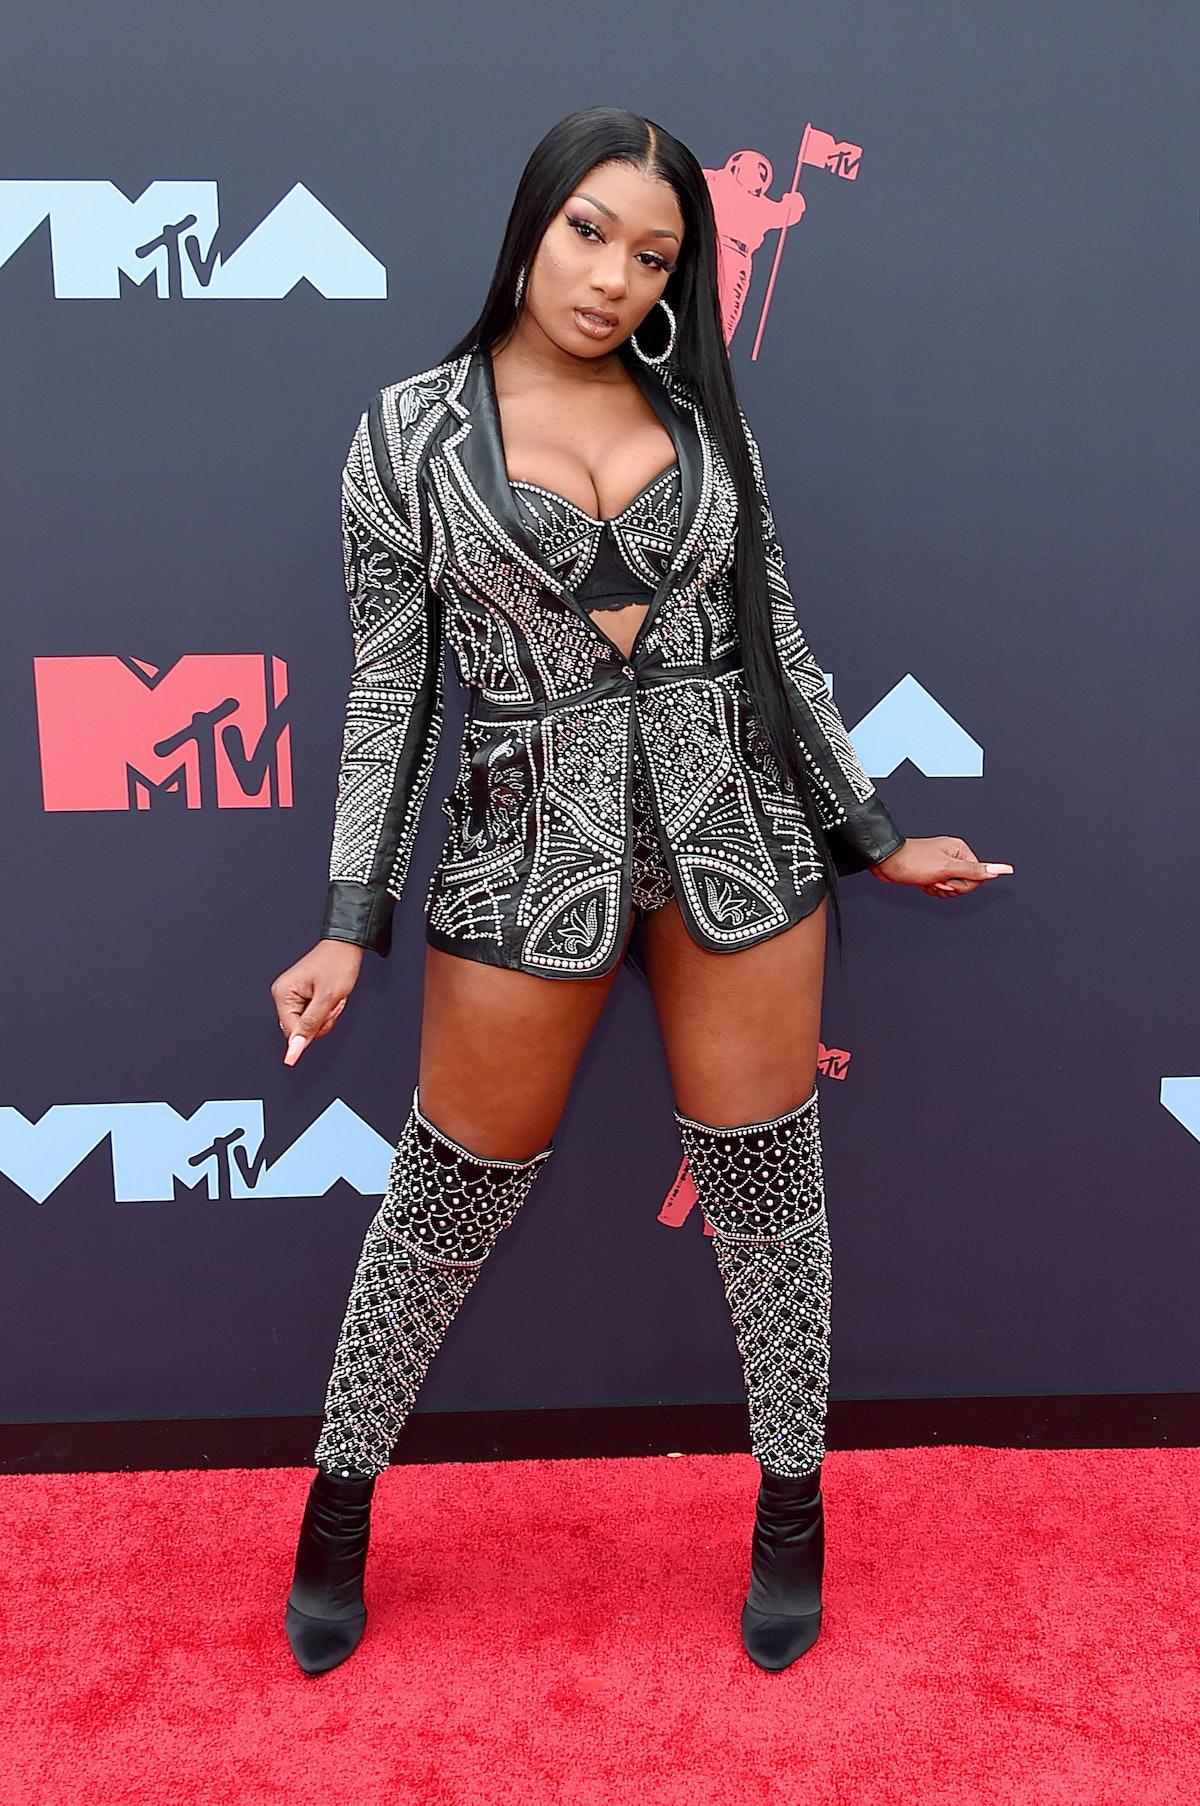 Megan at the VMA carpet